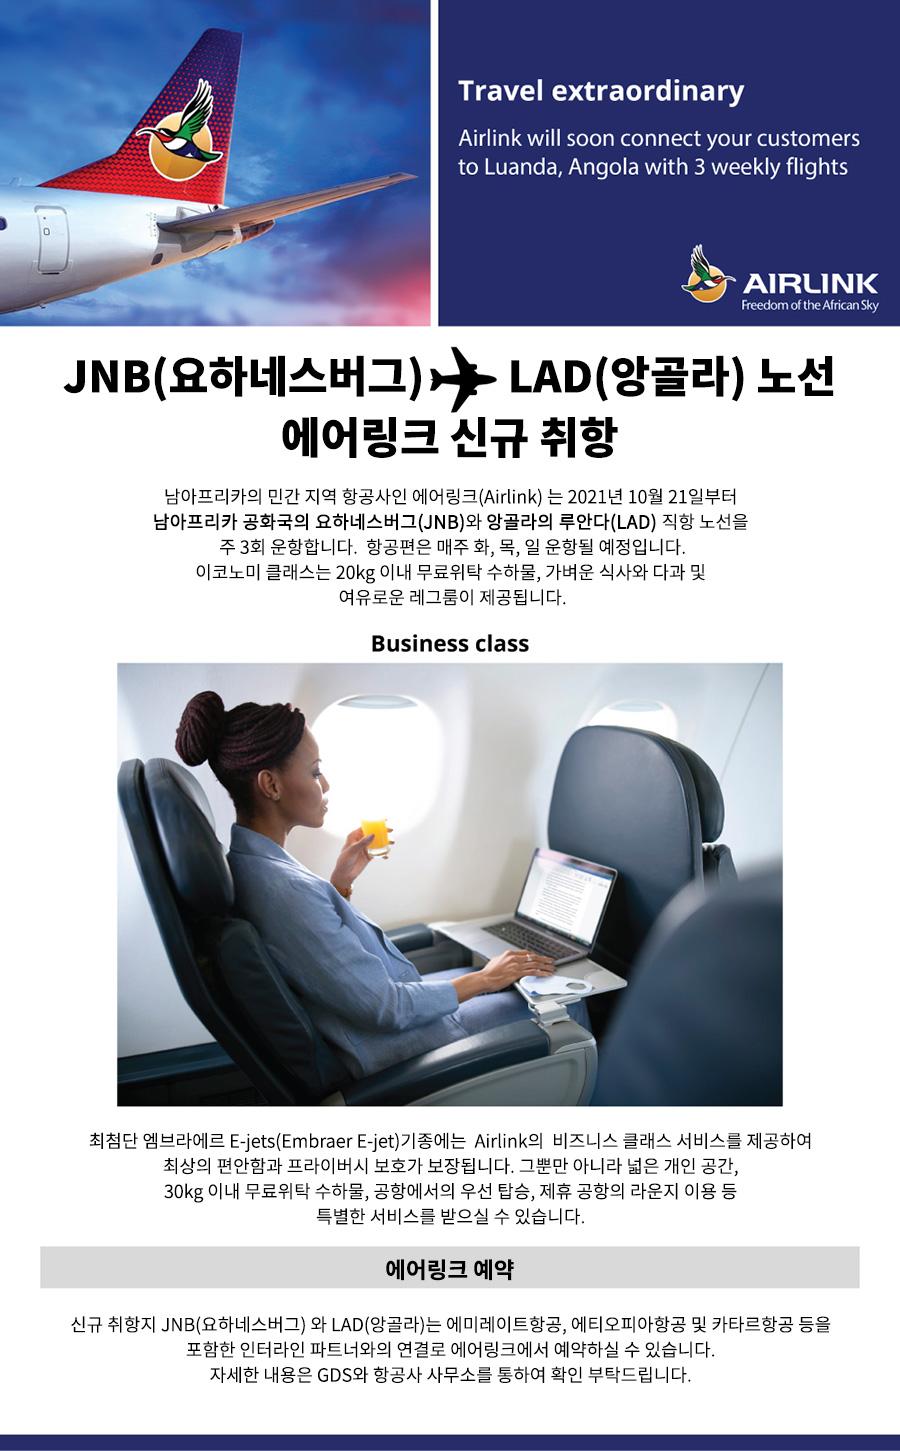 www.flyairlink.com